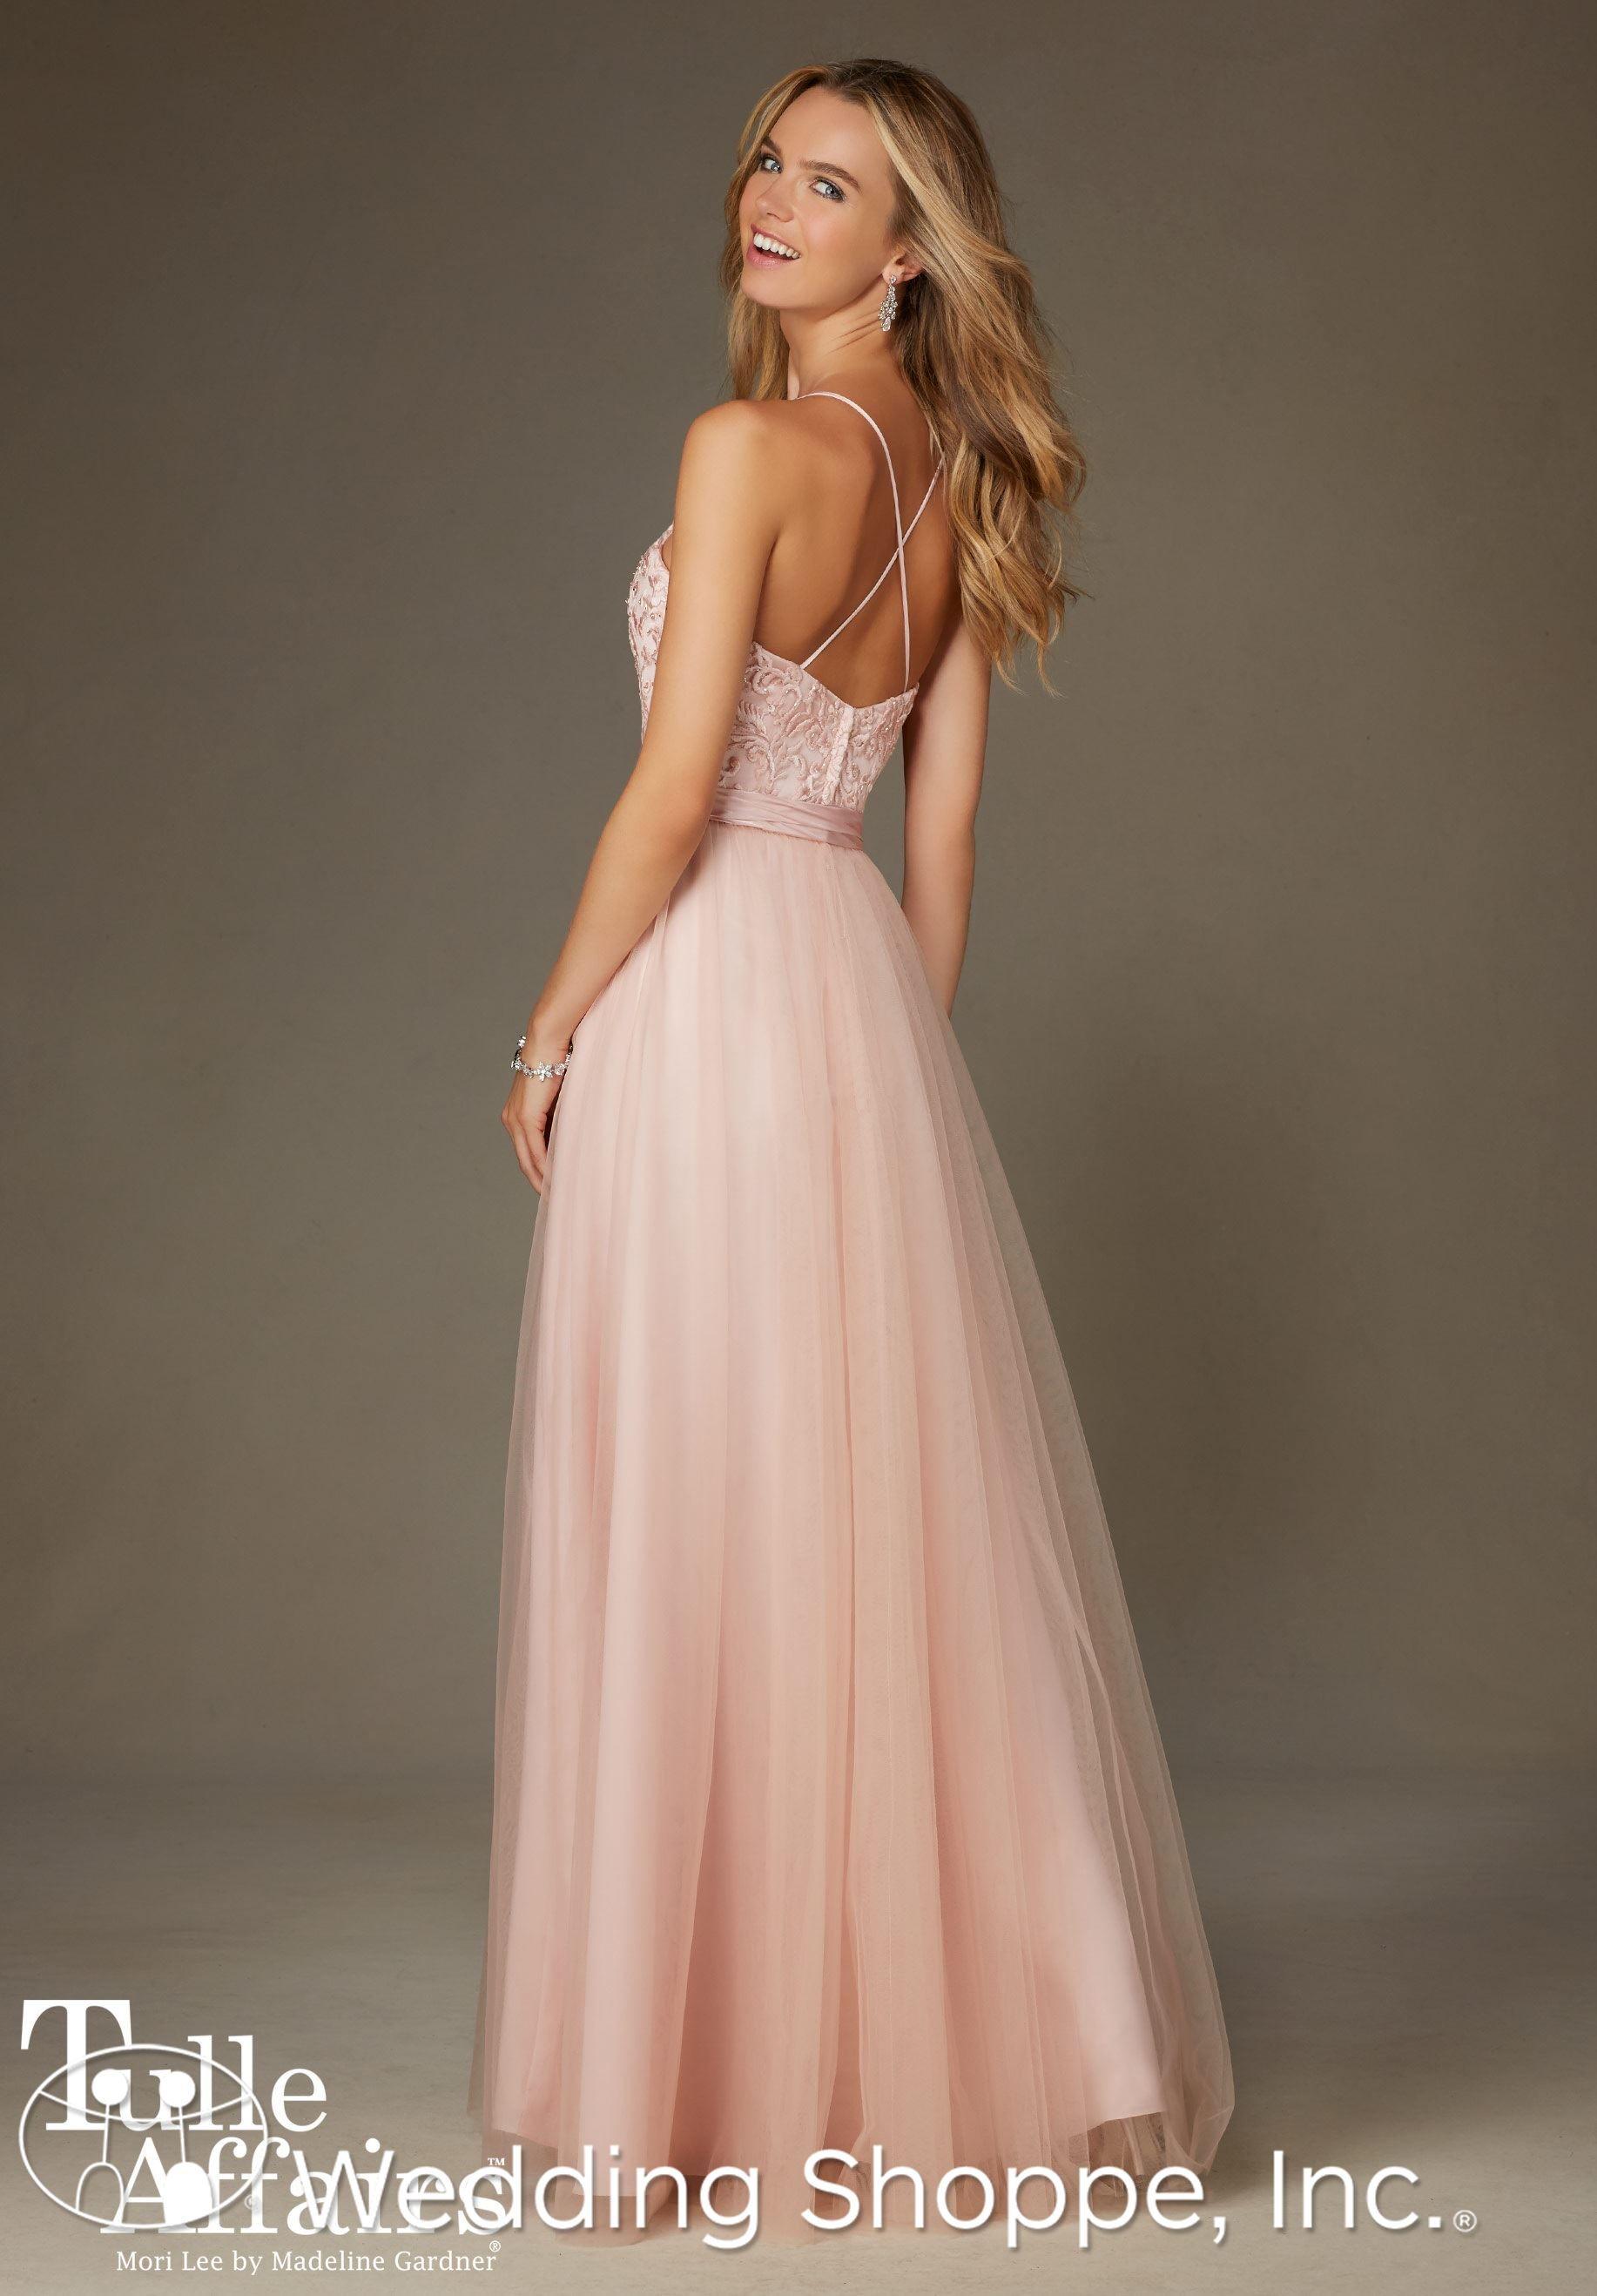 Mori lee bridesmaid dress bridesmaid bride dresses